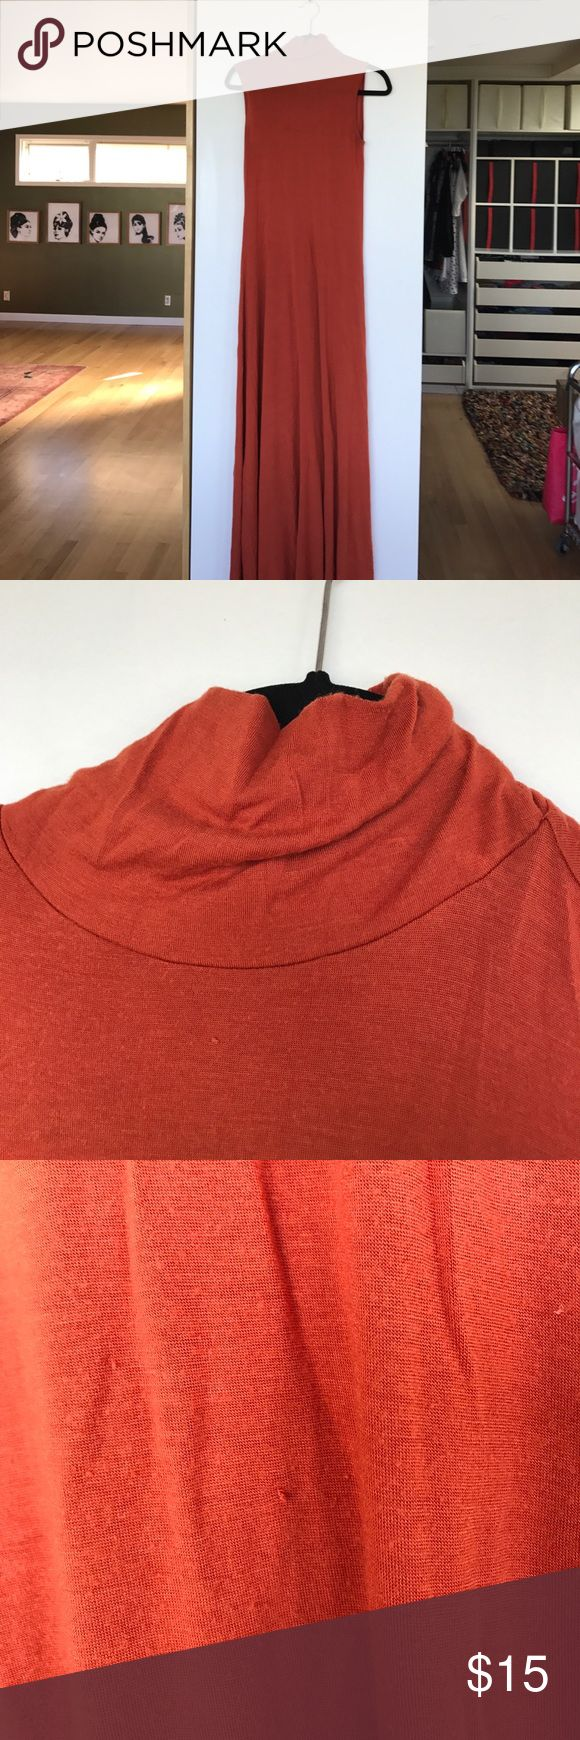 Rachel Pally Maxi Dress Size Small Orange Rachel Pally mock neck Maxi dress.  Super cute with a brown belt.  Has some pilling on entire dress. Rachel Pally Dresses Maxi